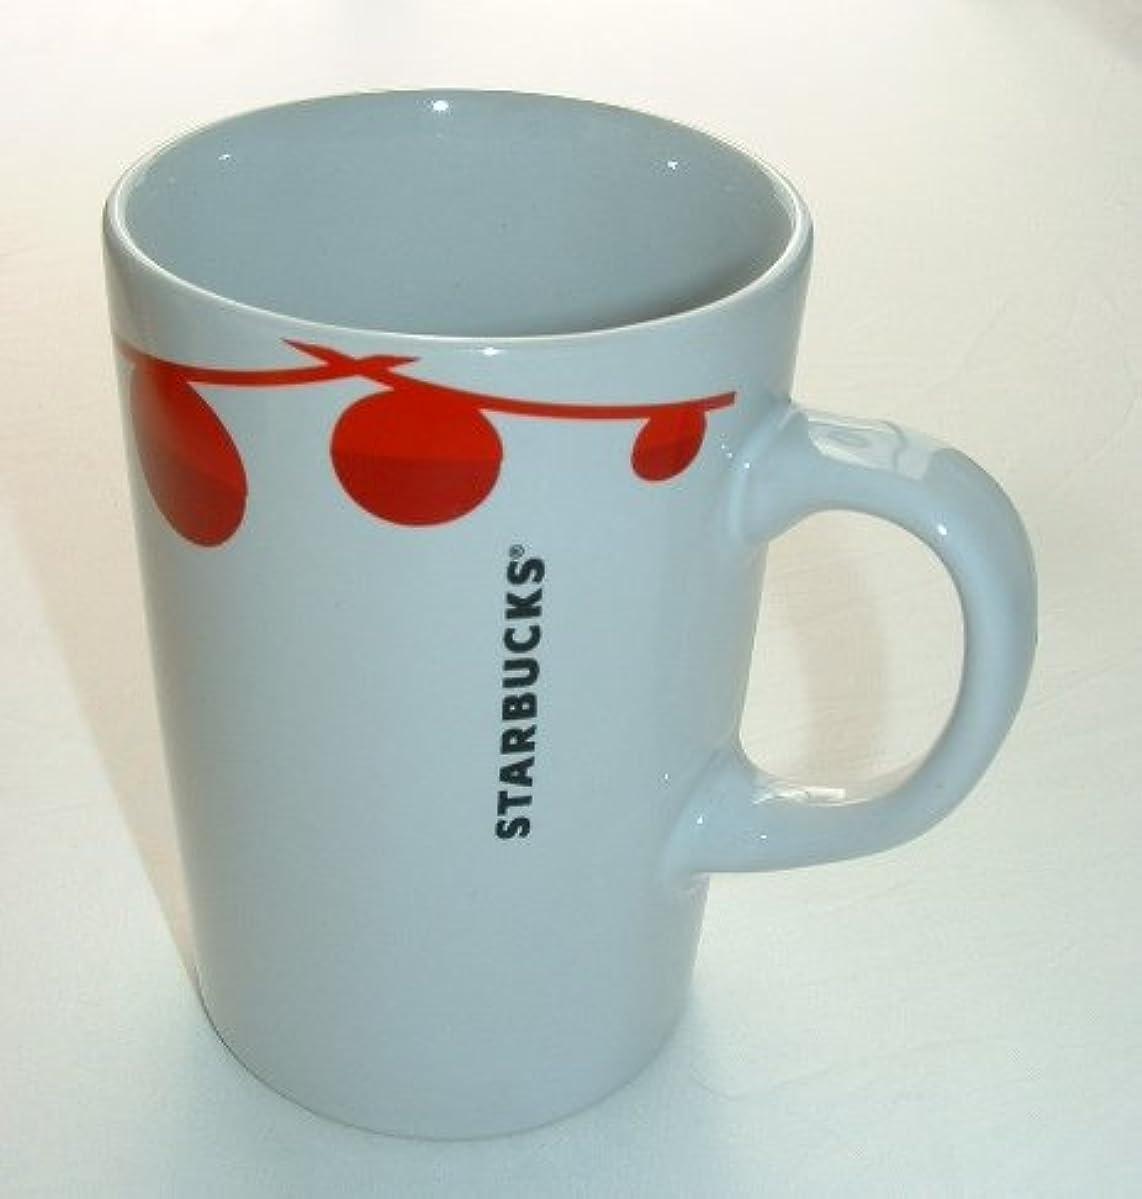 Starbucks Festive Holiday Red Baubles Mug